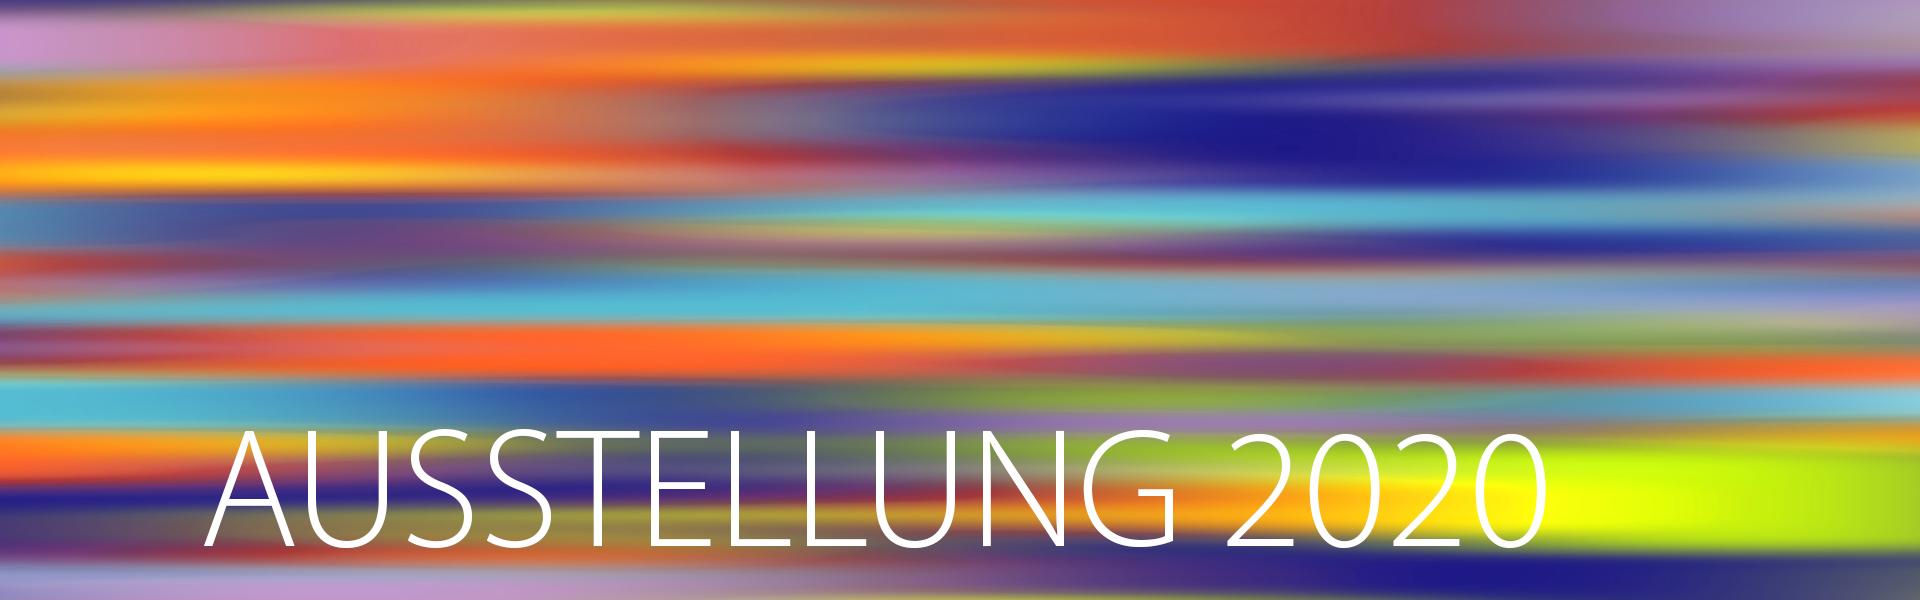 Ausstellung 2020